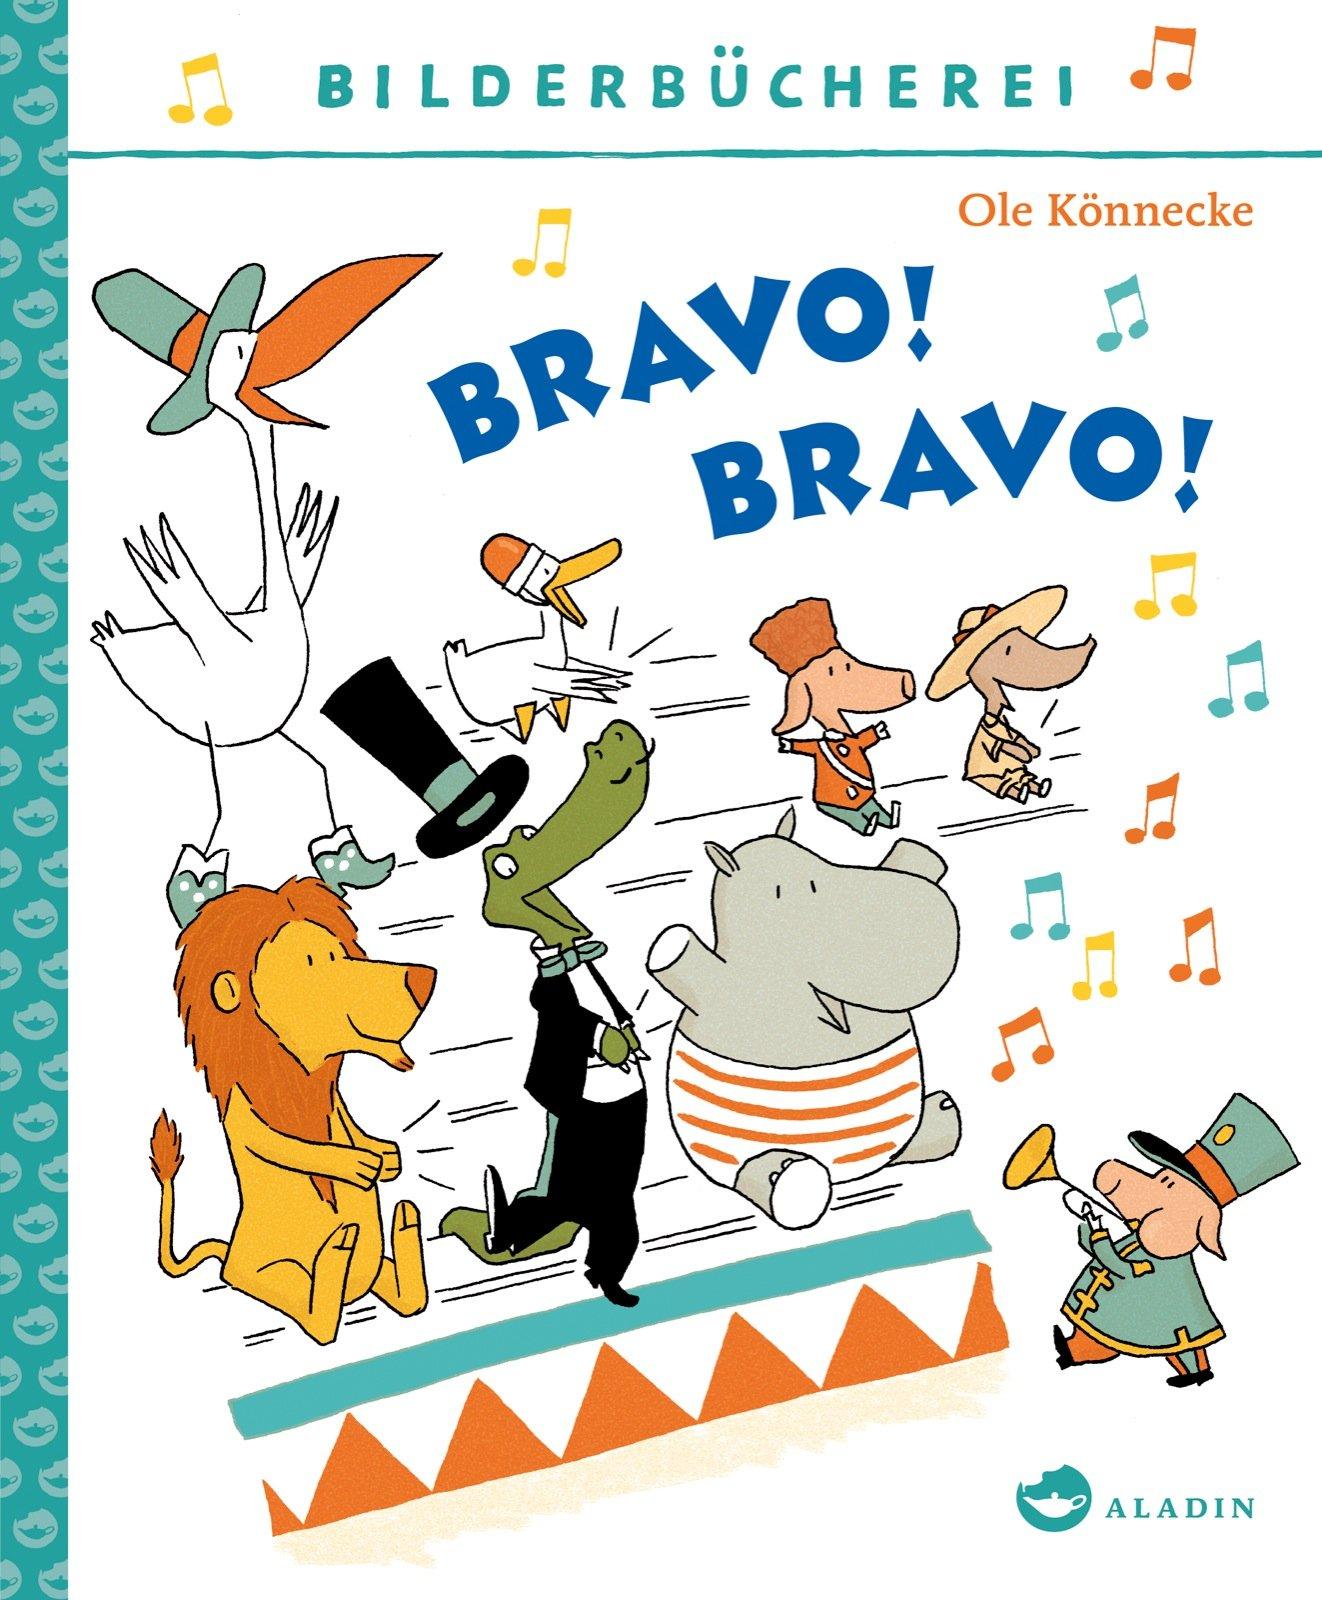 Bravo! Bravo!